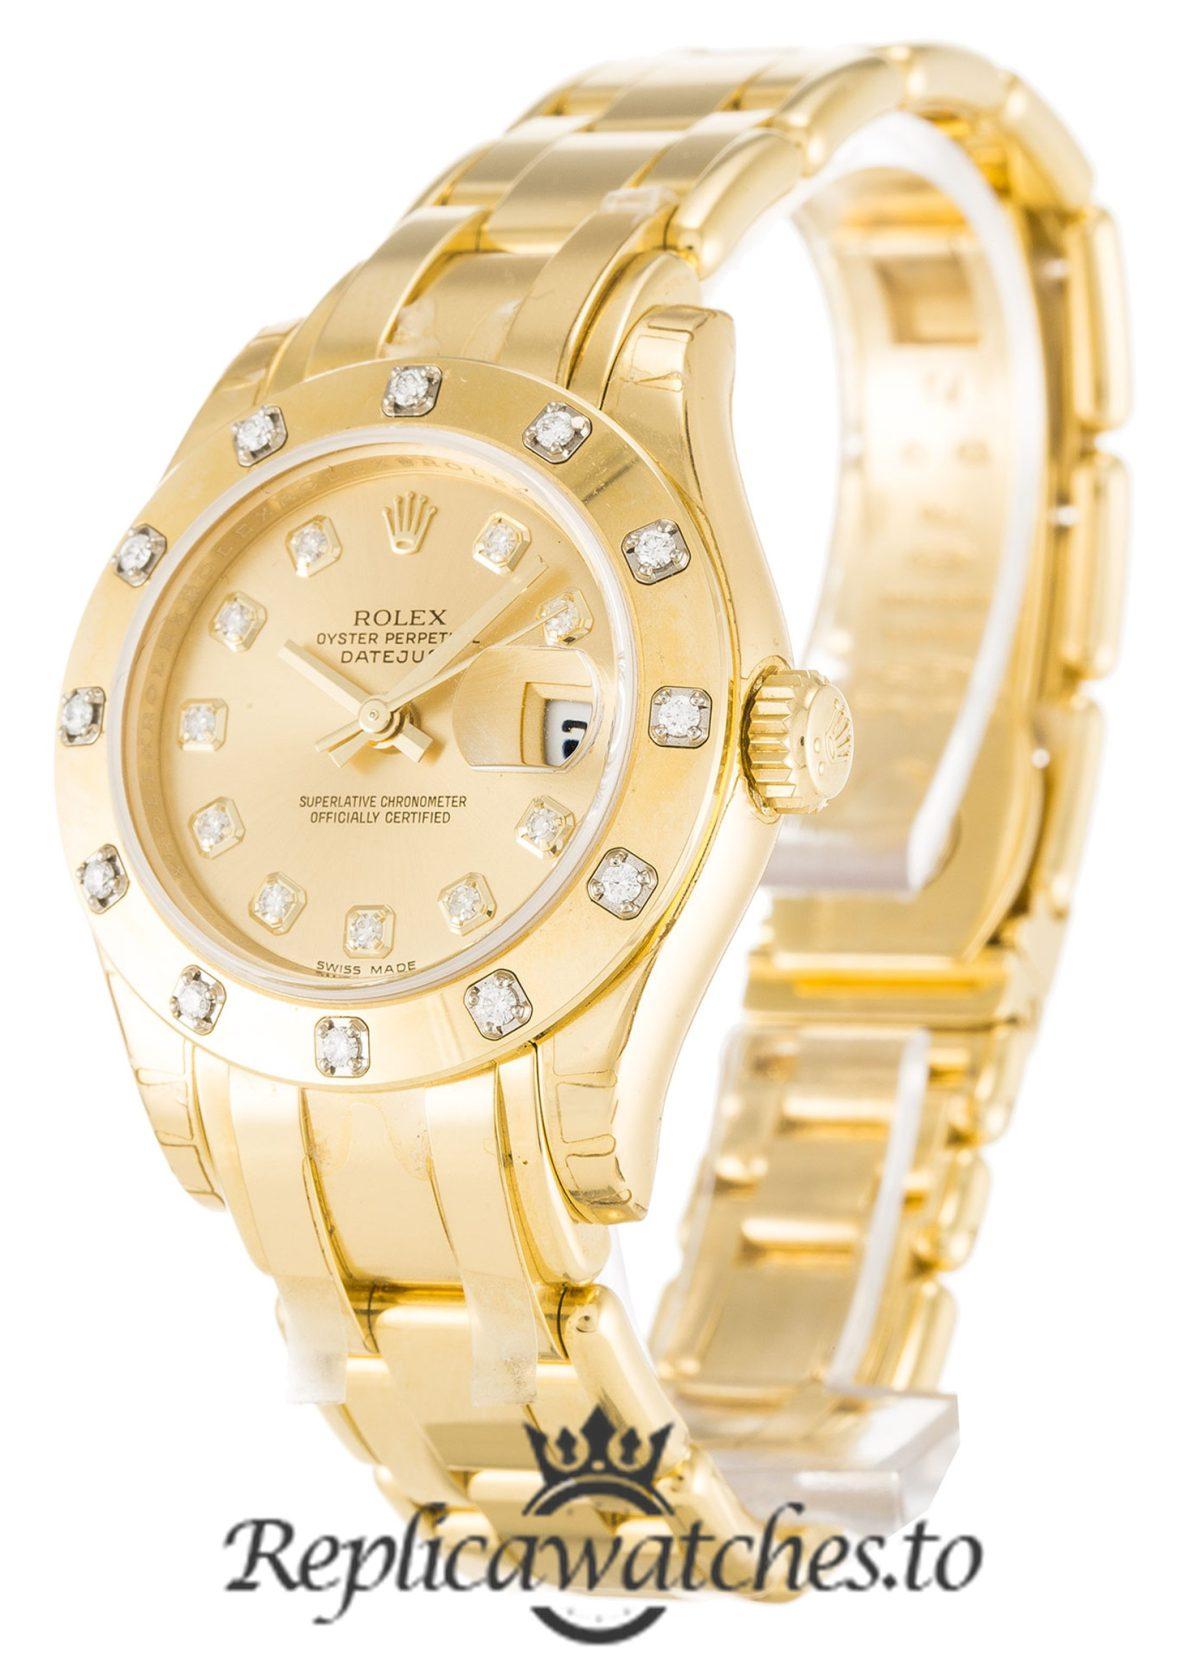 Rolex Pearlmaster Replica 80318 001 Yellow Gold Strap 29MM